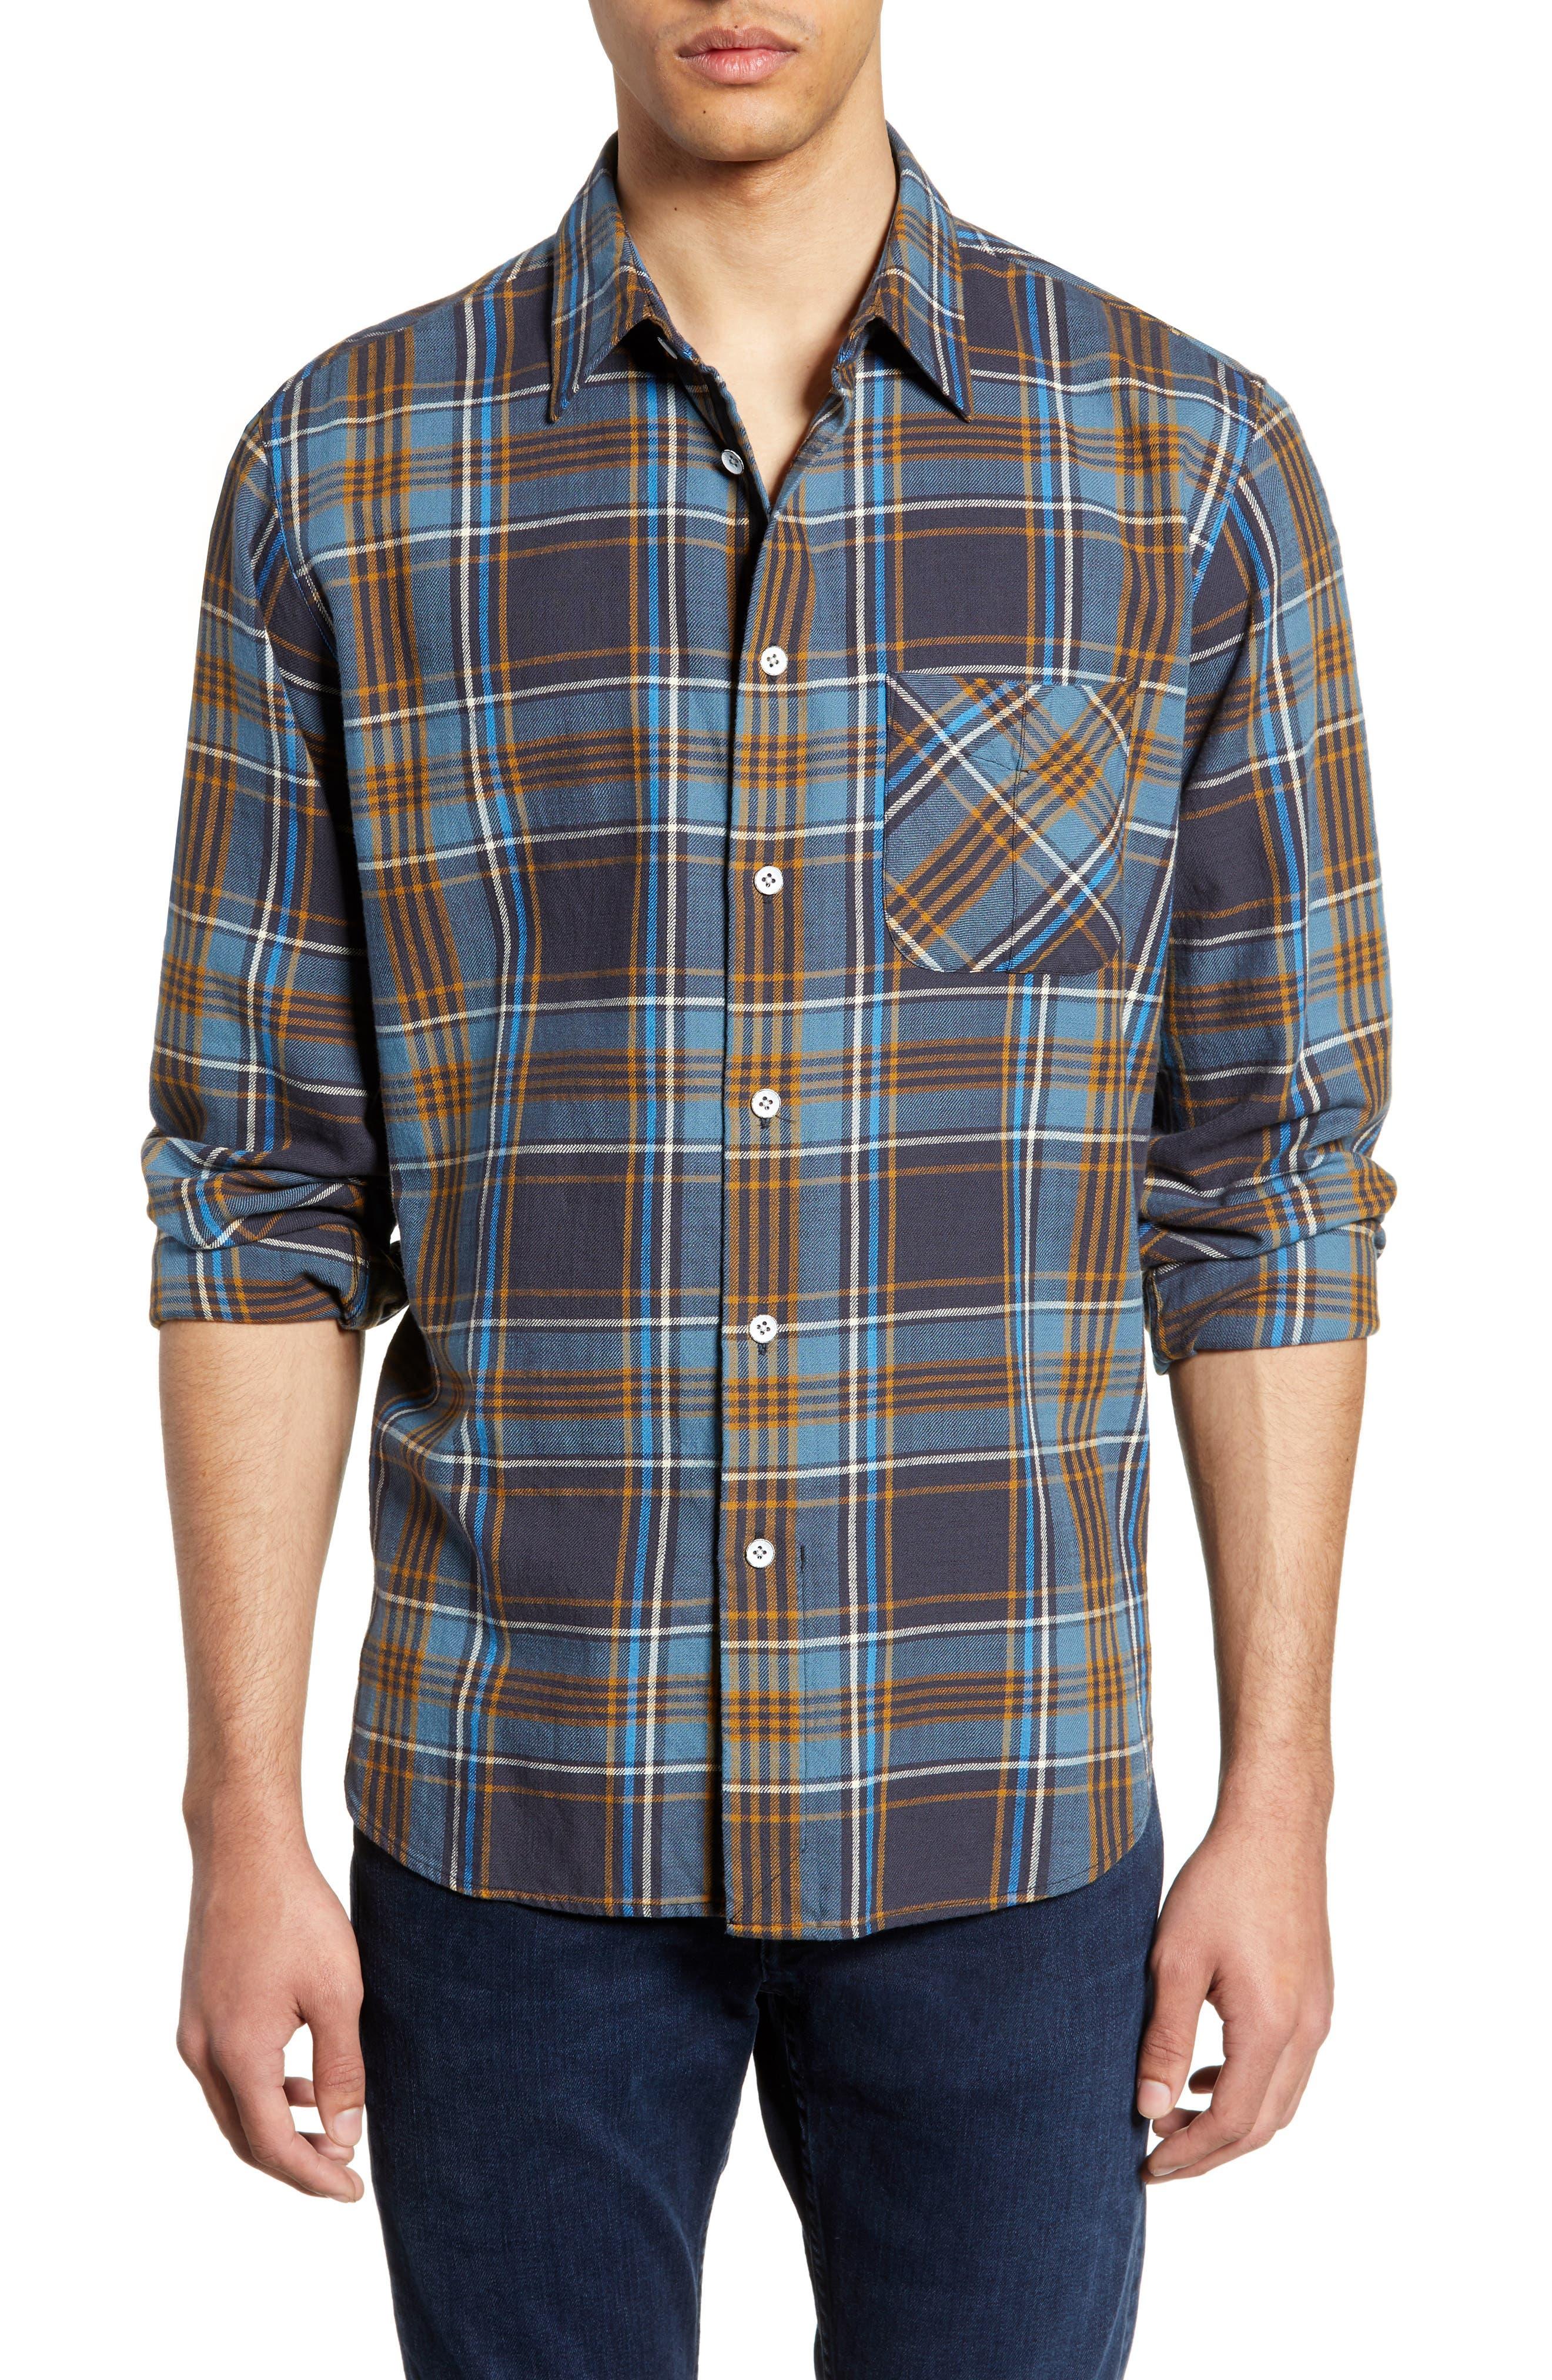 Rag & Bone Fit 3 Regular Fit Beach Shirt, Blue